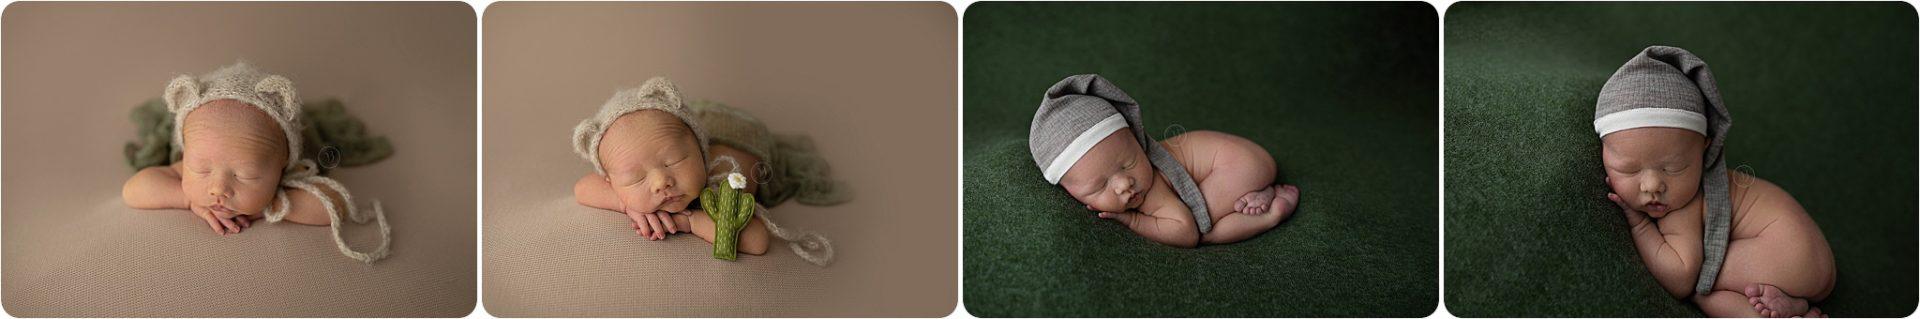 tucson baby cactus in photo shoot